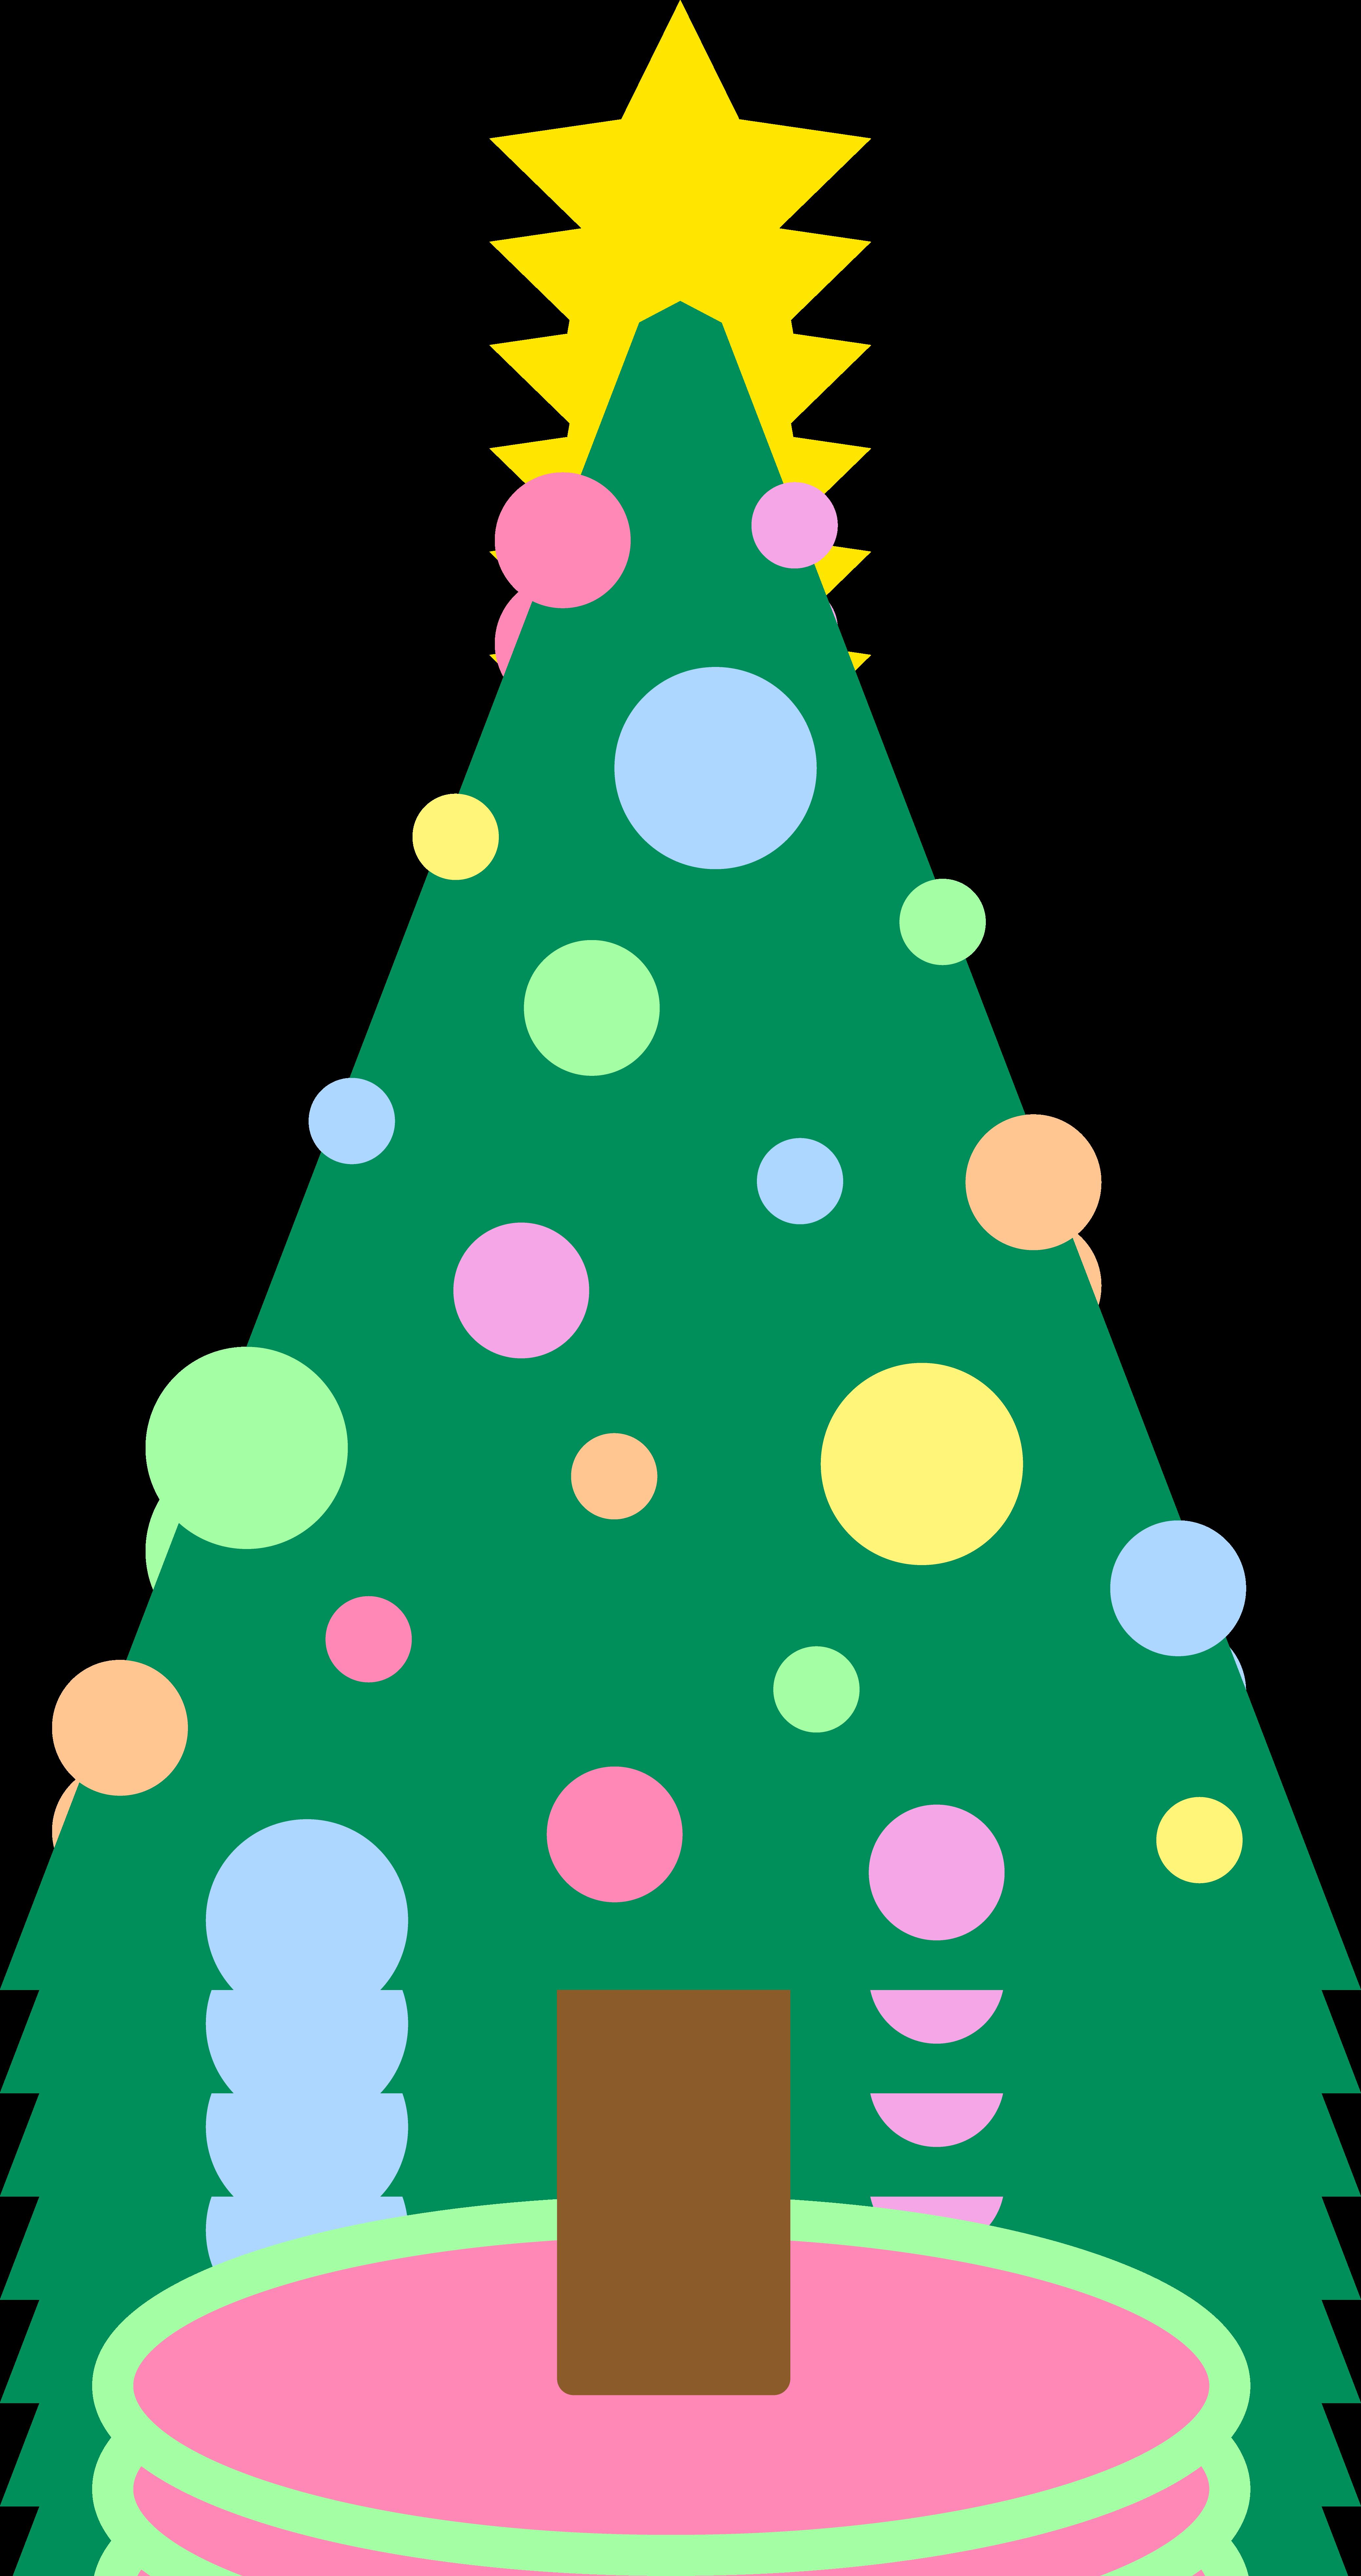 Simple Christmas Tree Clipart | Clipart Panda - Free ...